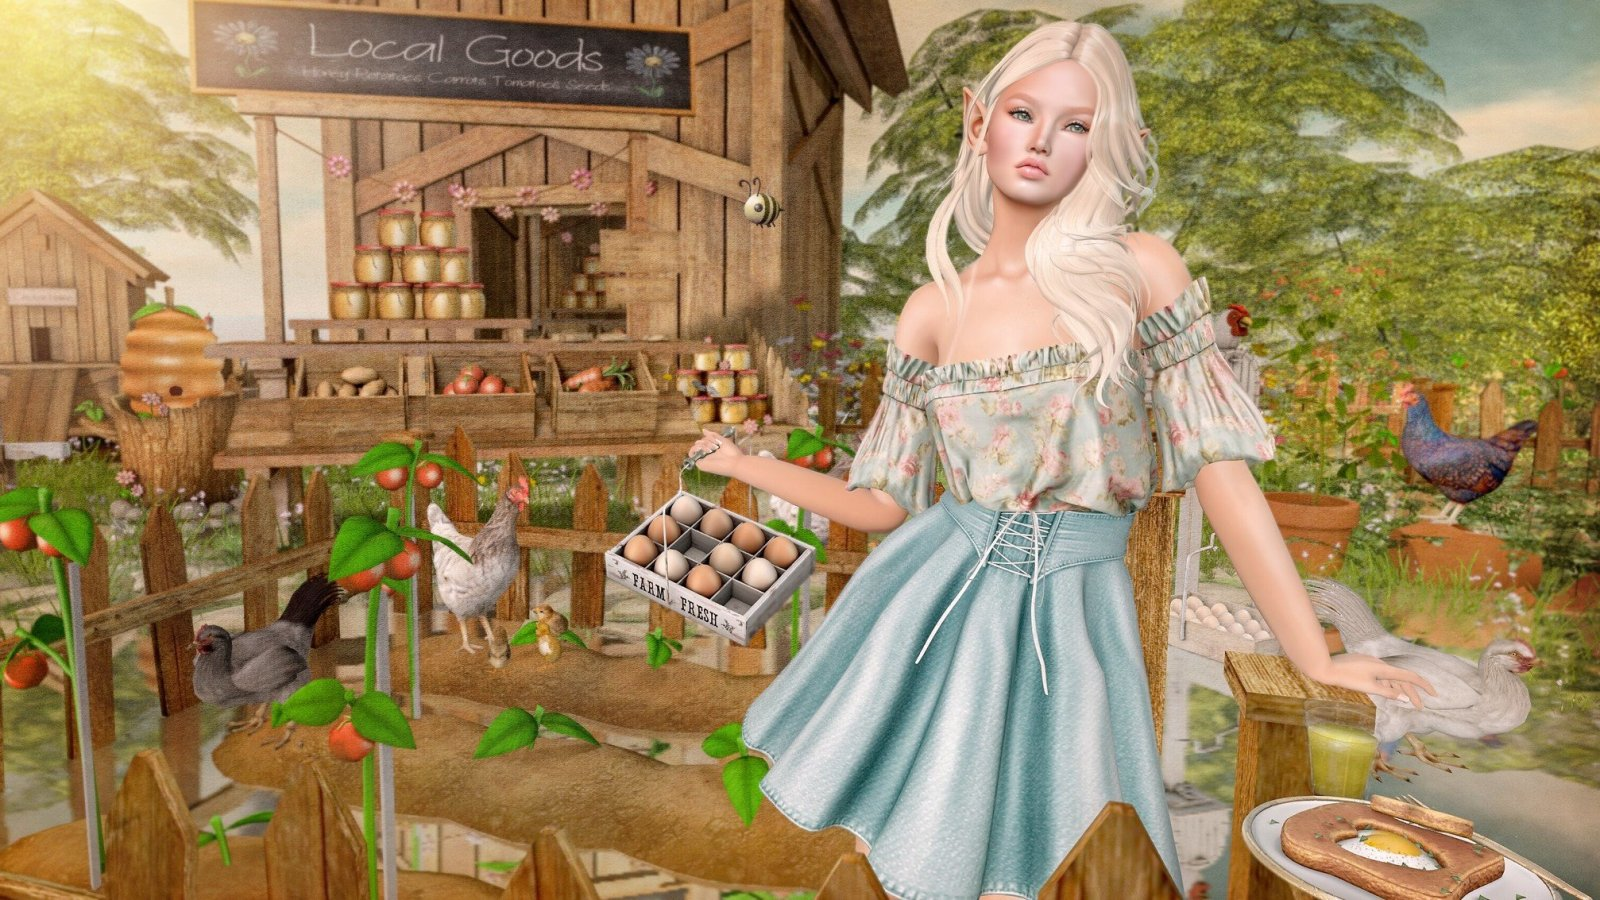 Eggcellent Goods